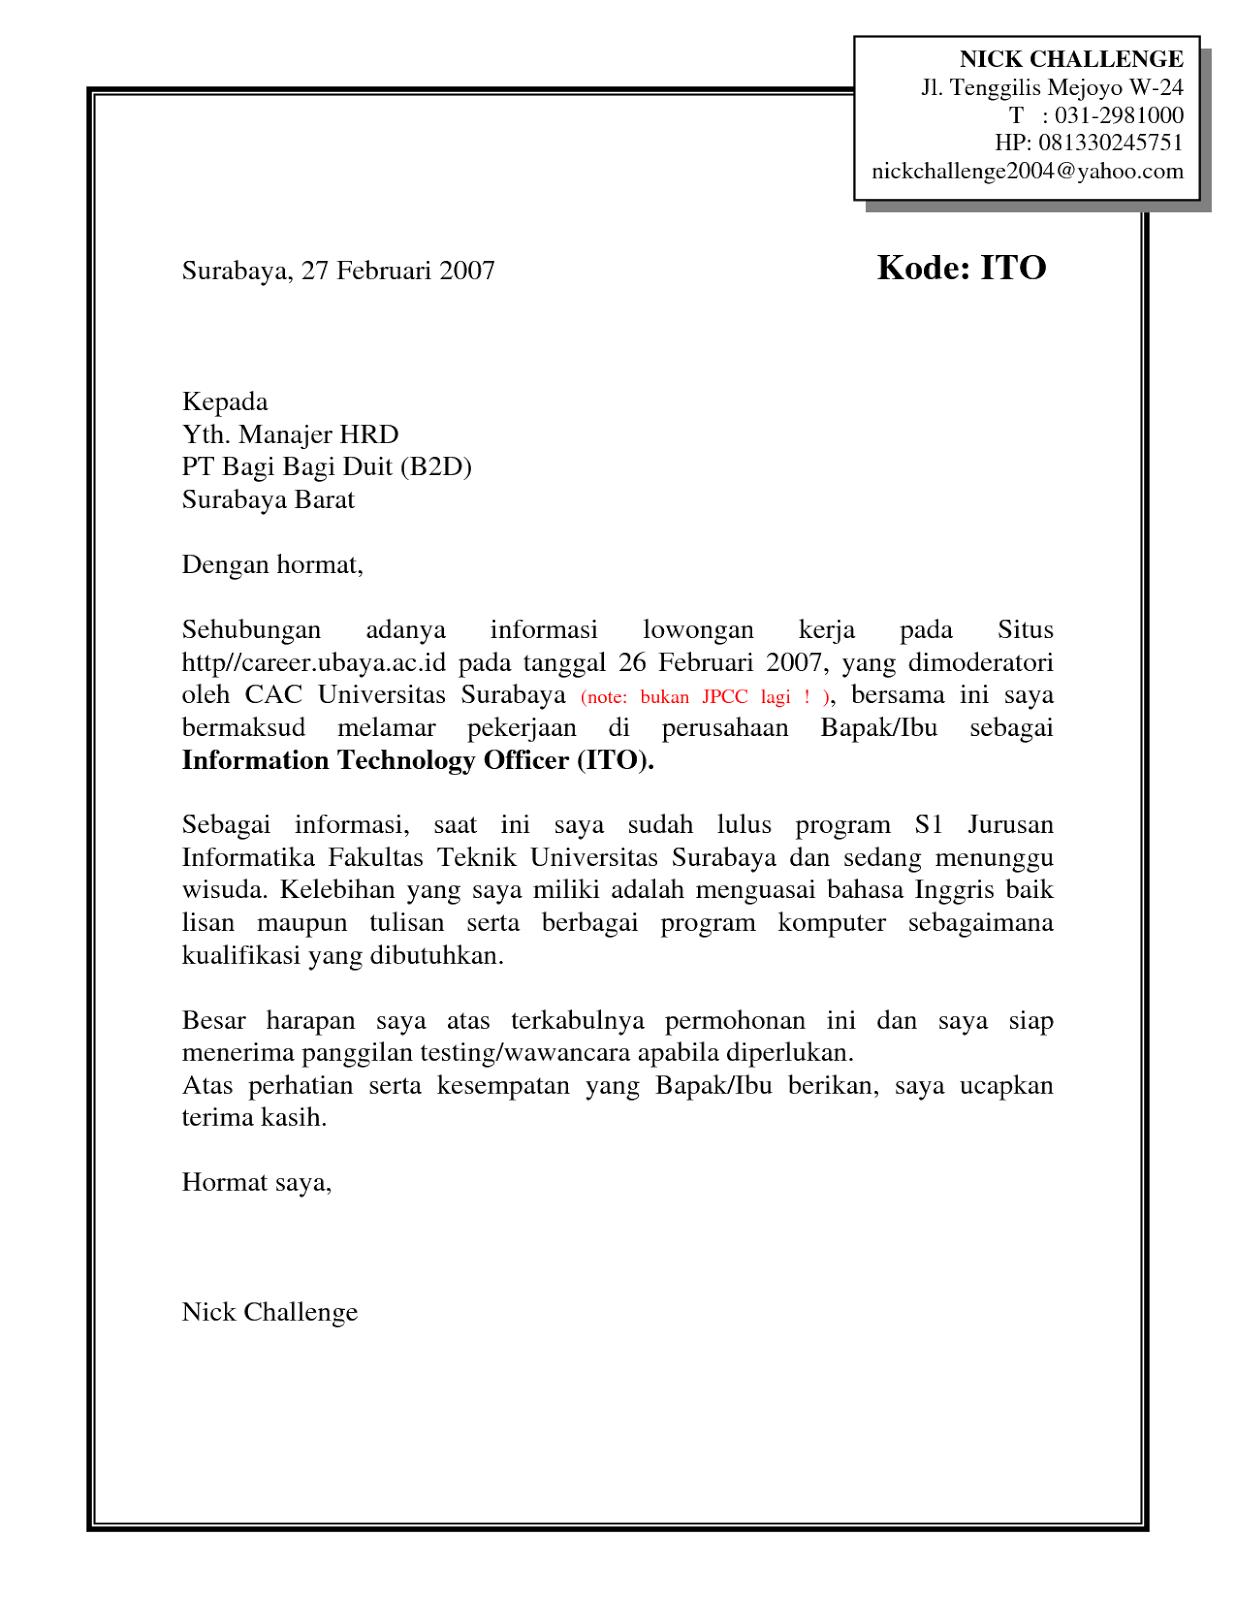 Contoh Surat Lamaran Kerja PDF ben jobs Riwayat hidup